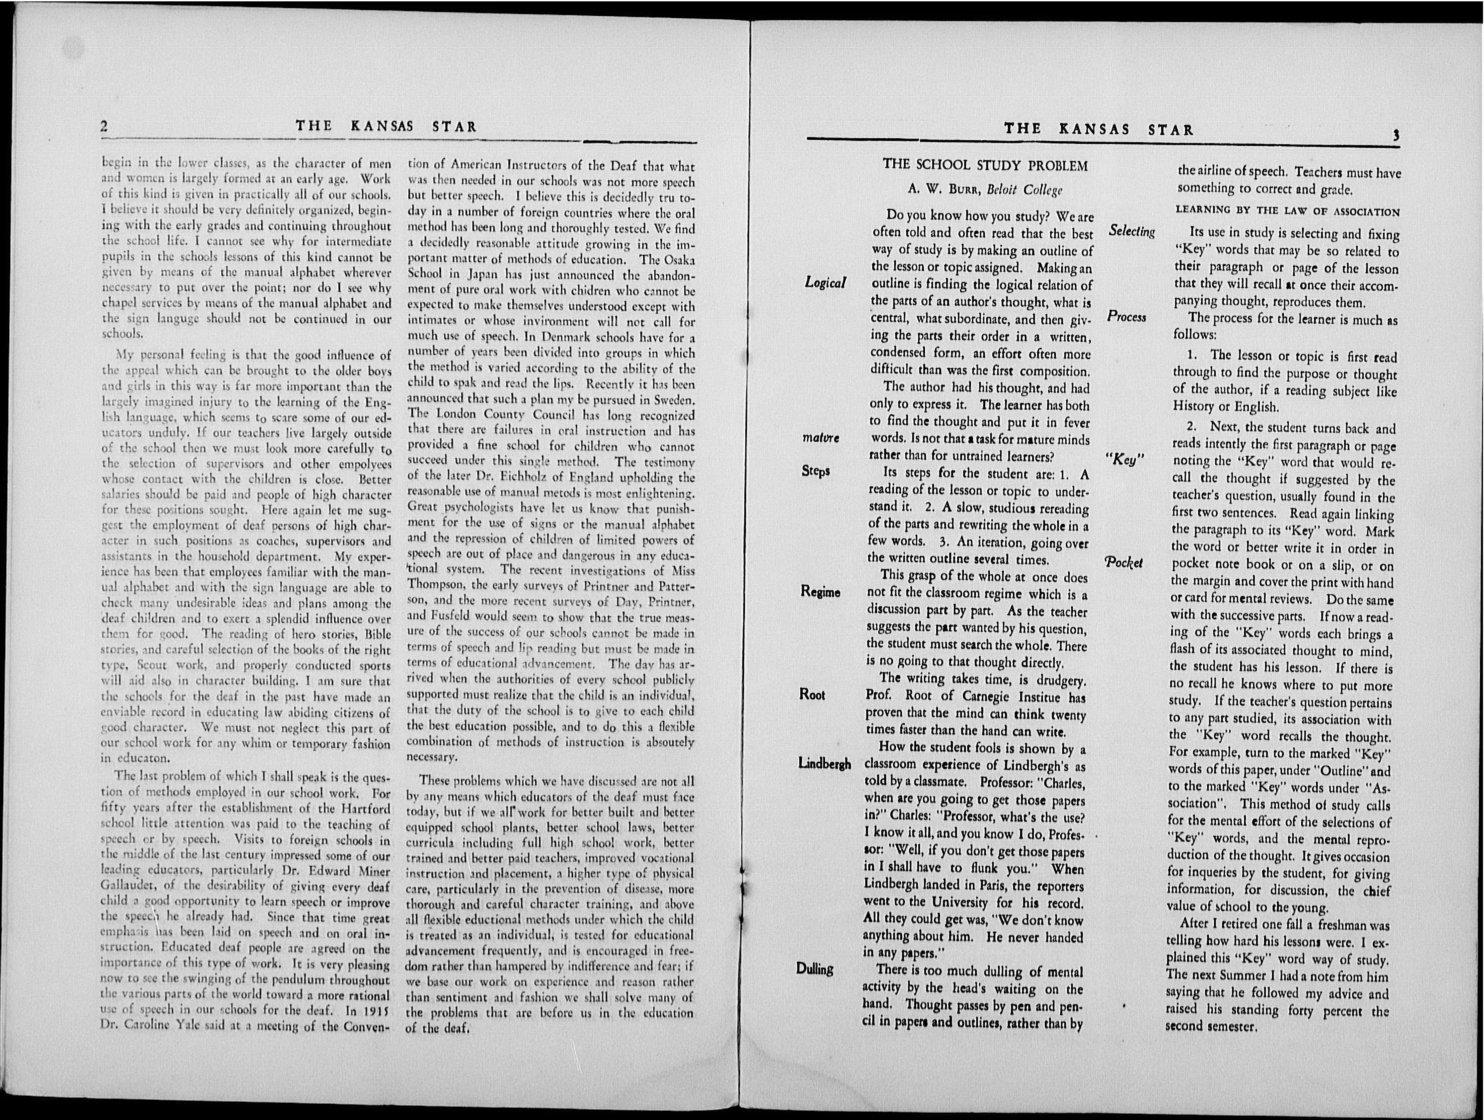 The Kansas Star, volume 58, number 3 - 2-3